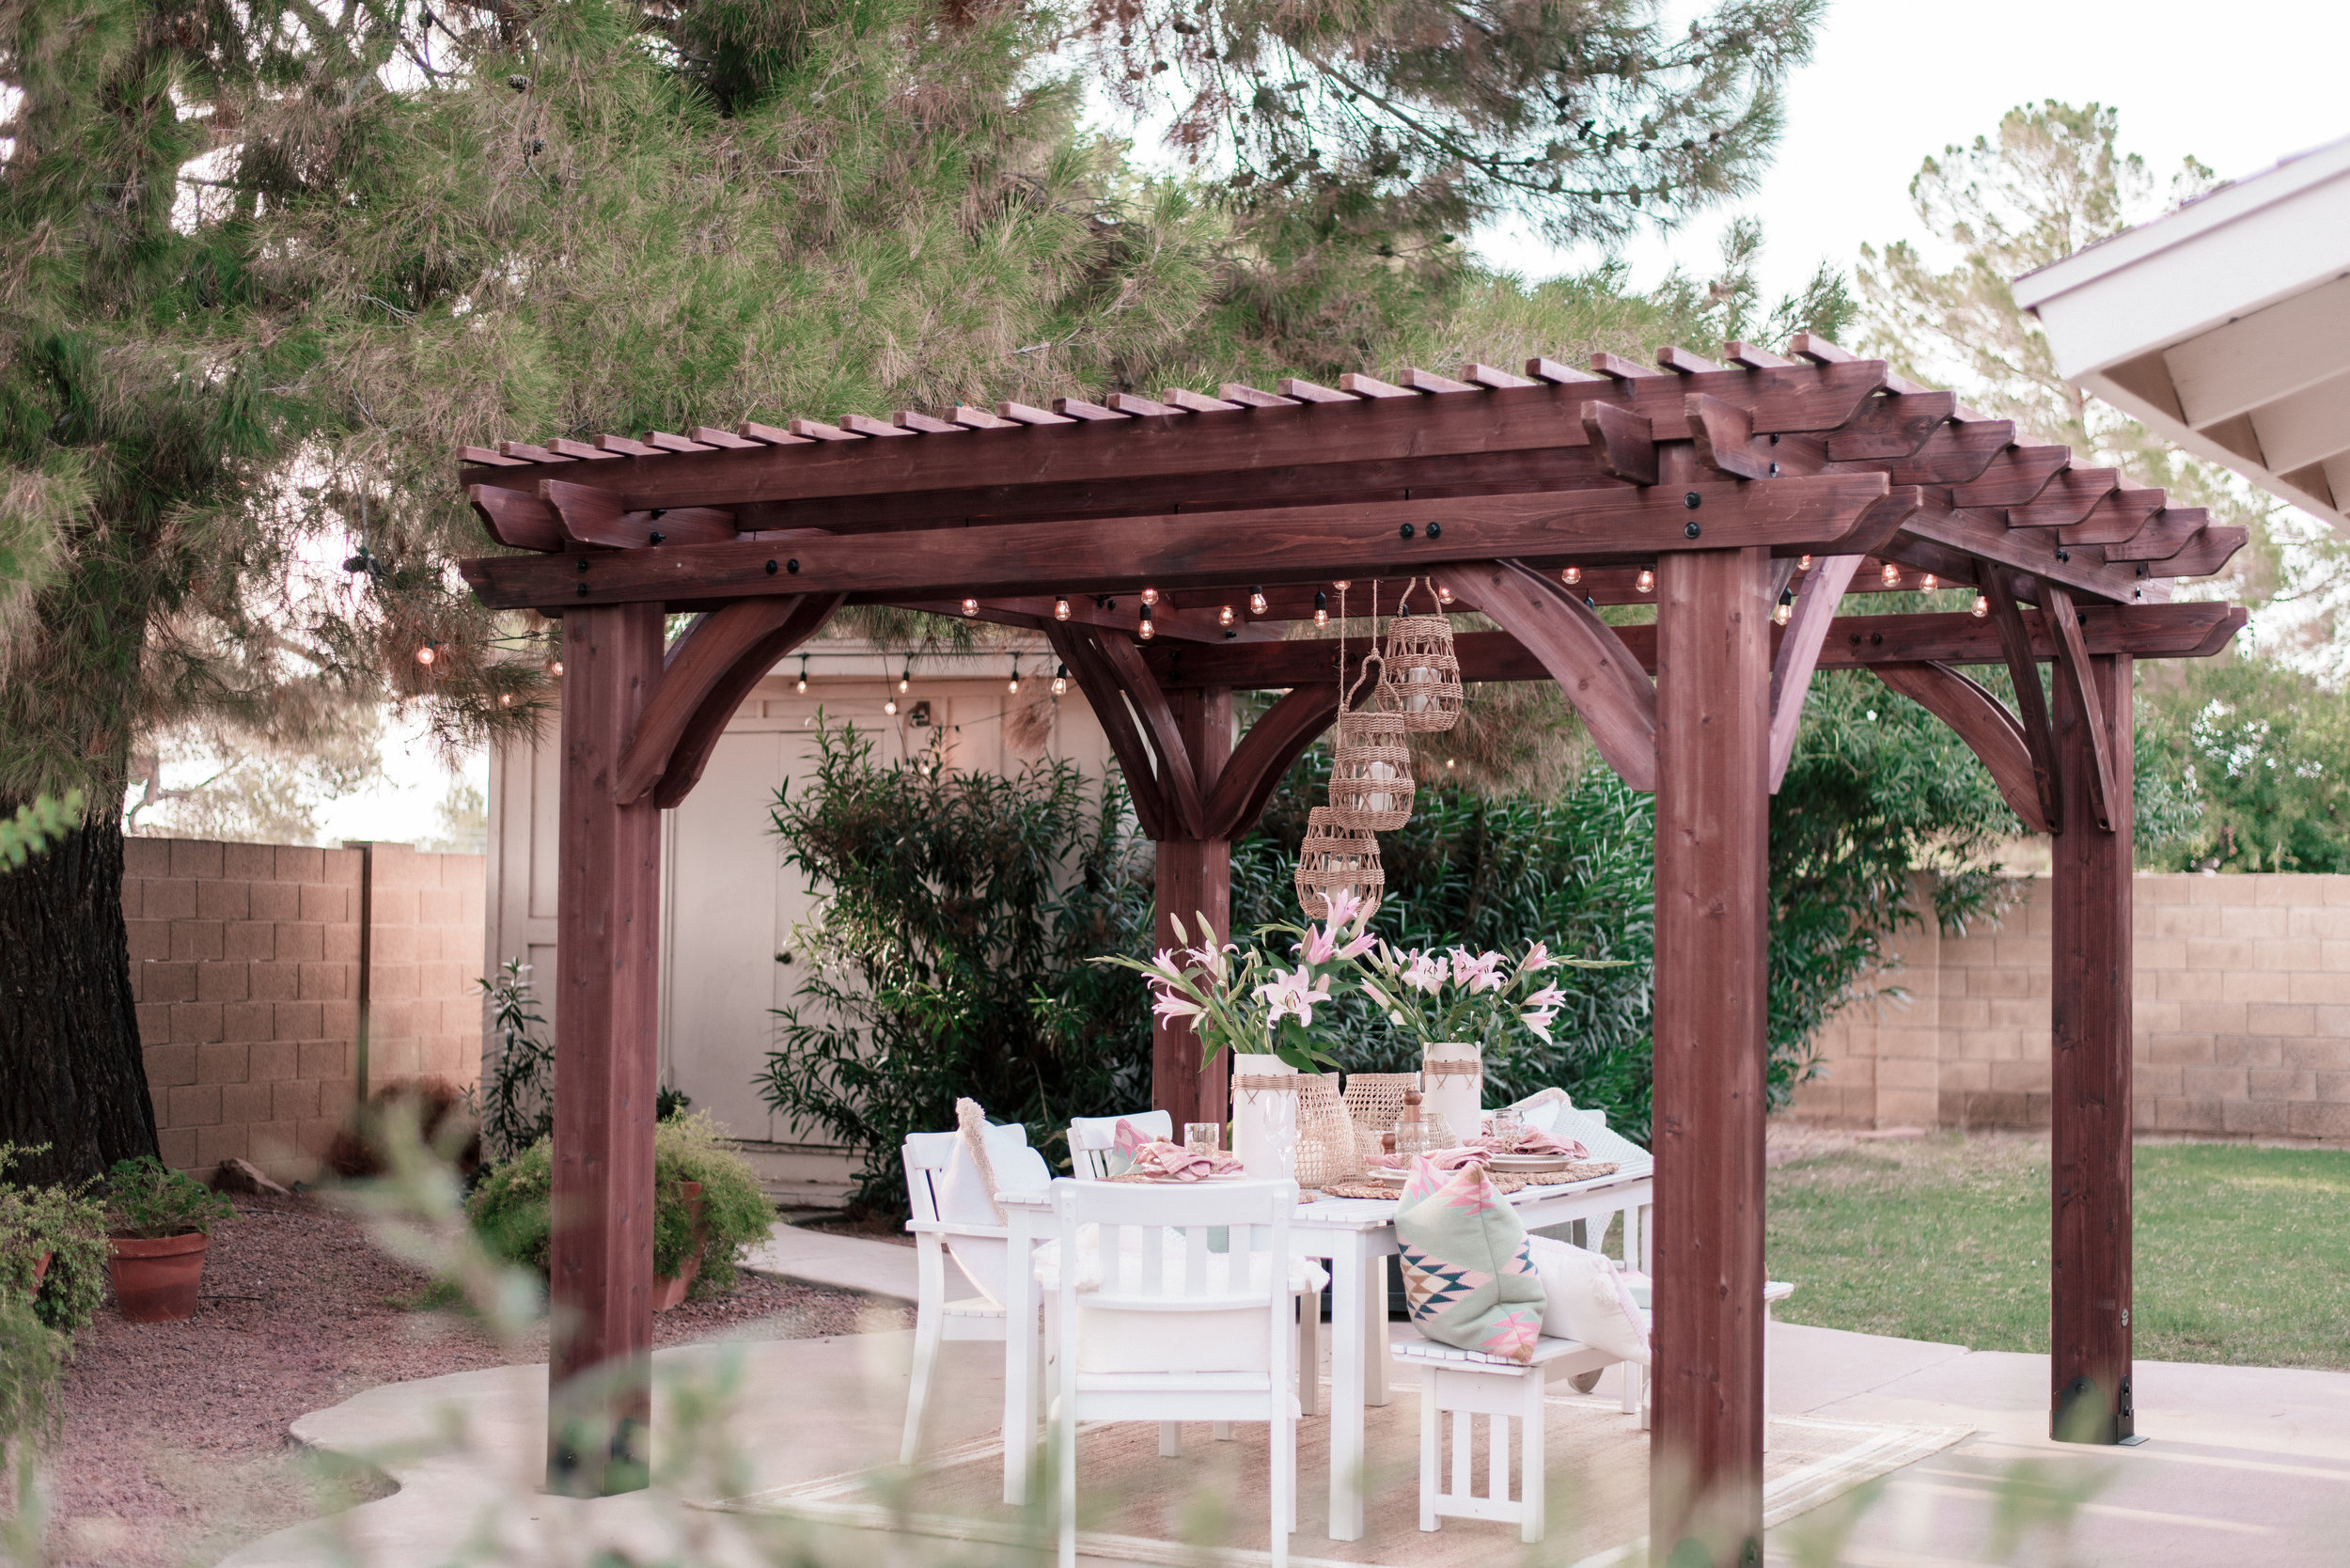 backyard-patio-pergola-plans-5.jpg